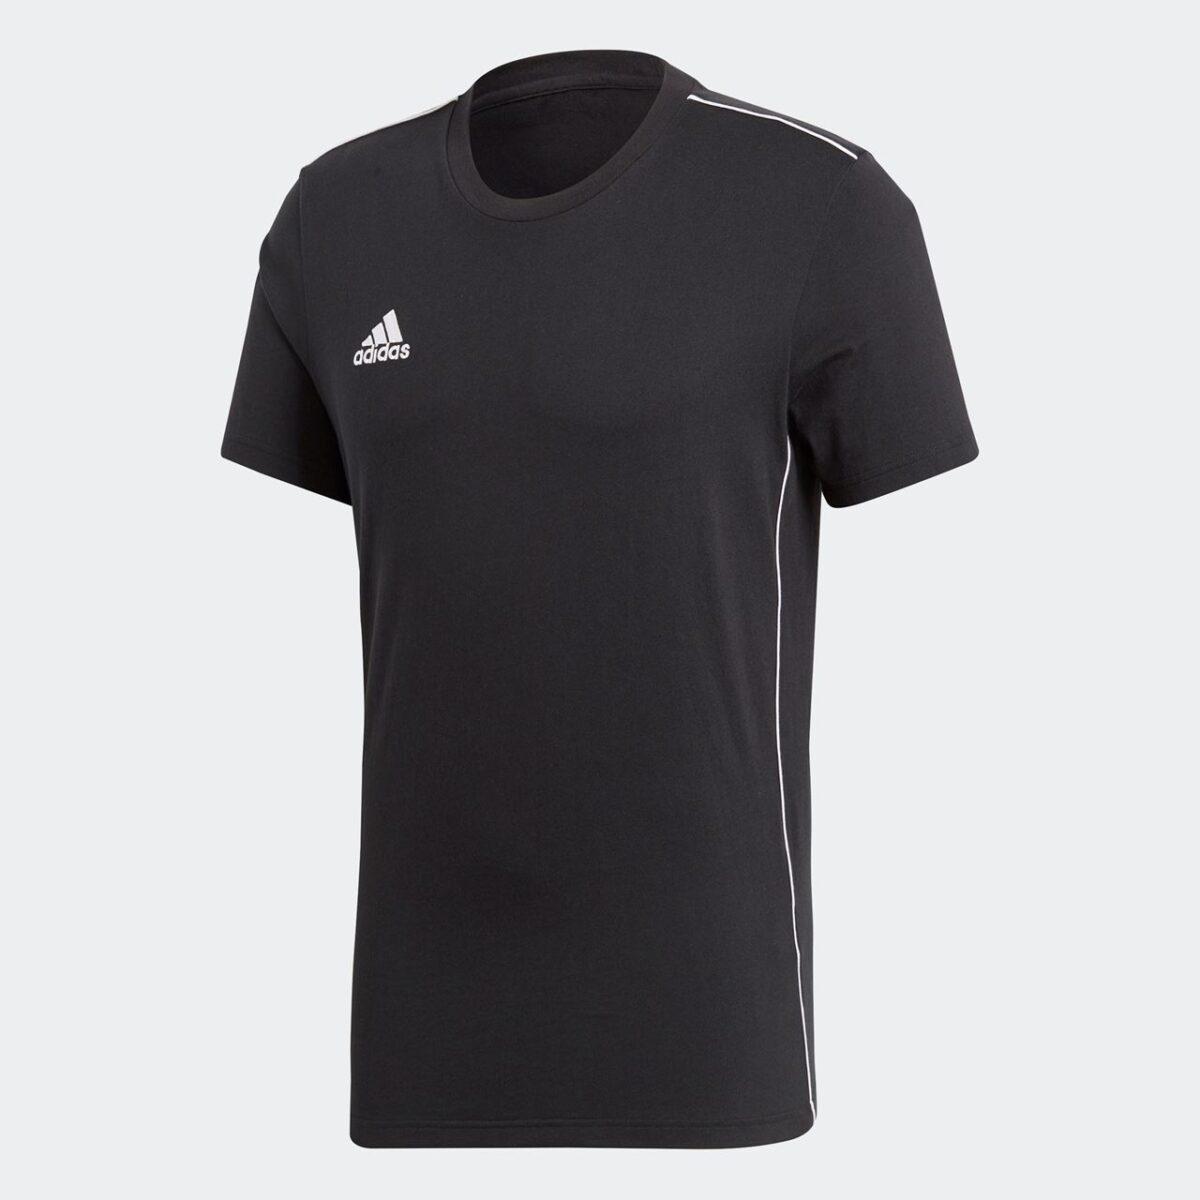 Adidas Core 18 TEE Adult